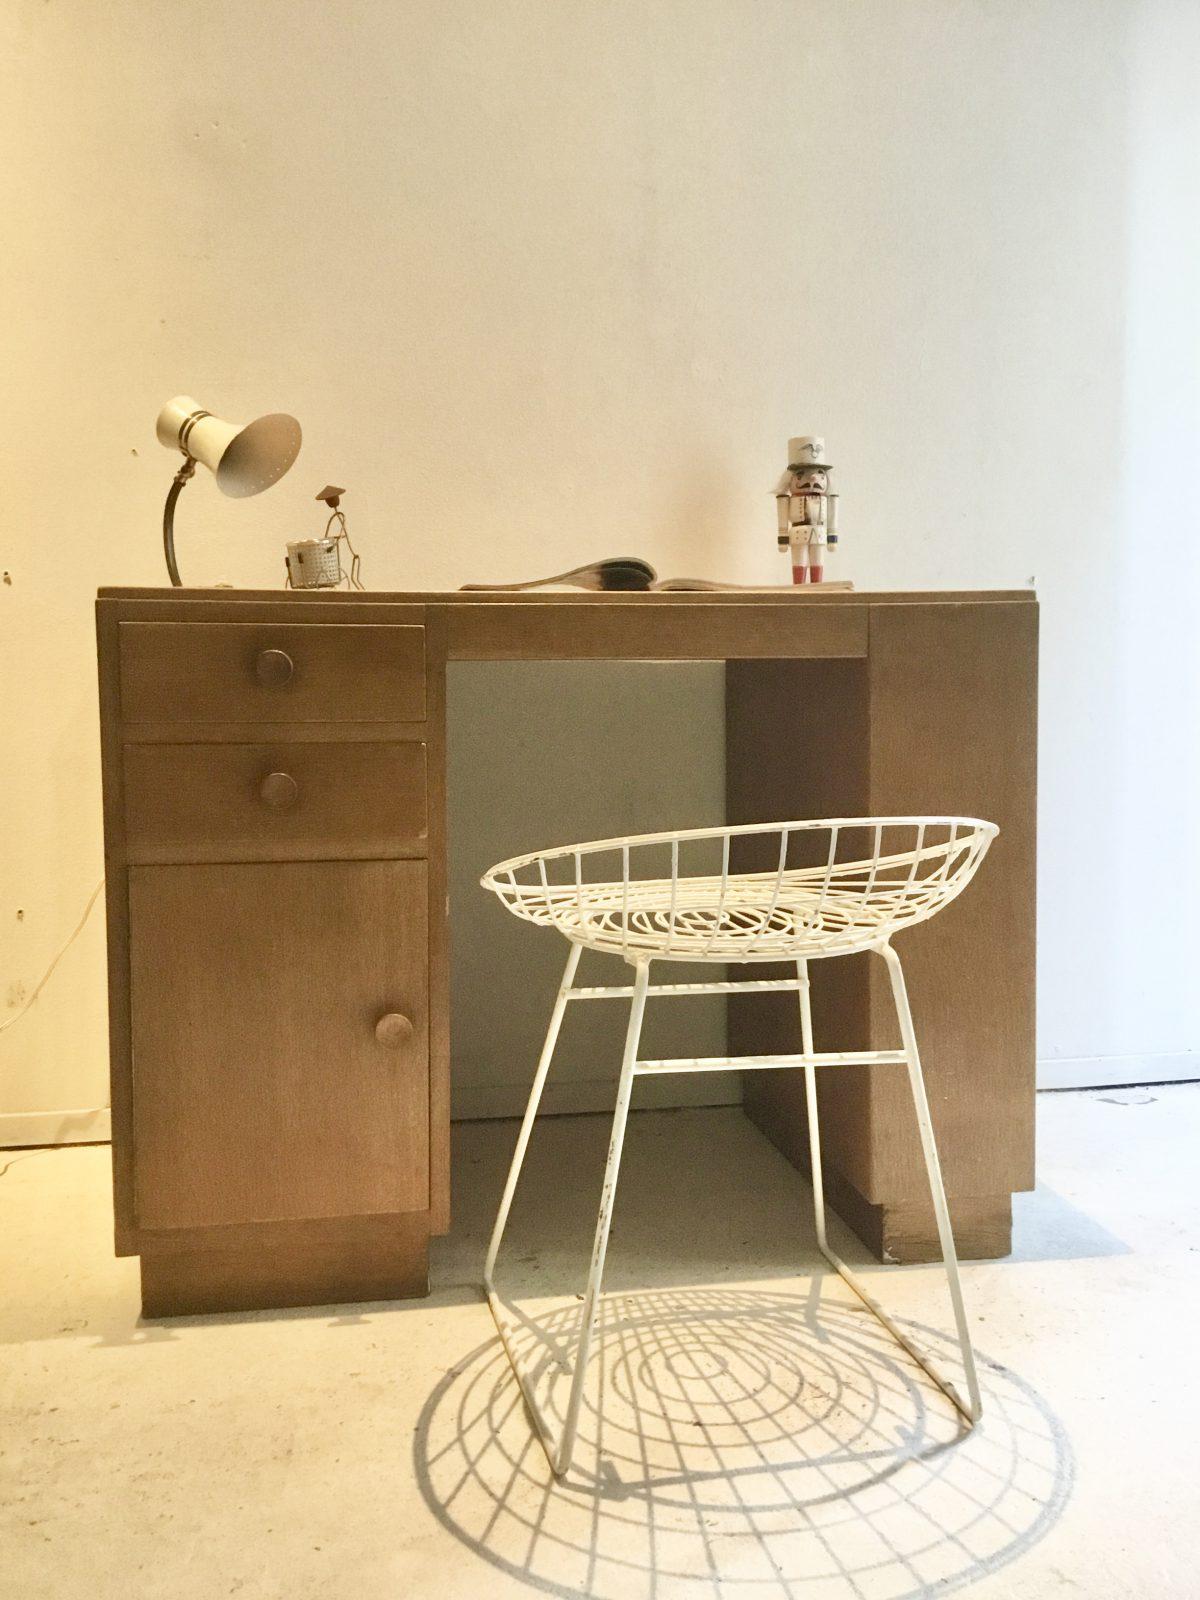 Vintage Station Vintage Furniture Design Meubelen Midcentury Furniture Retro Danish Design Cadovius